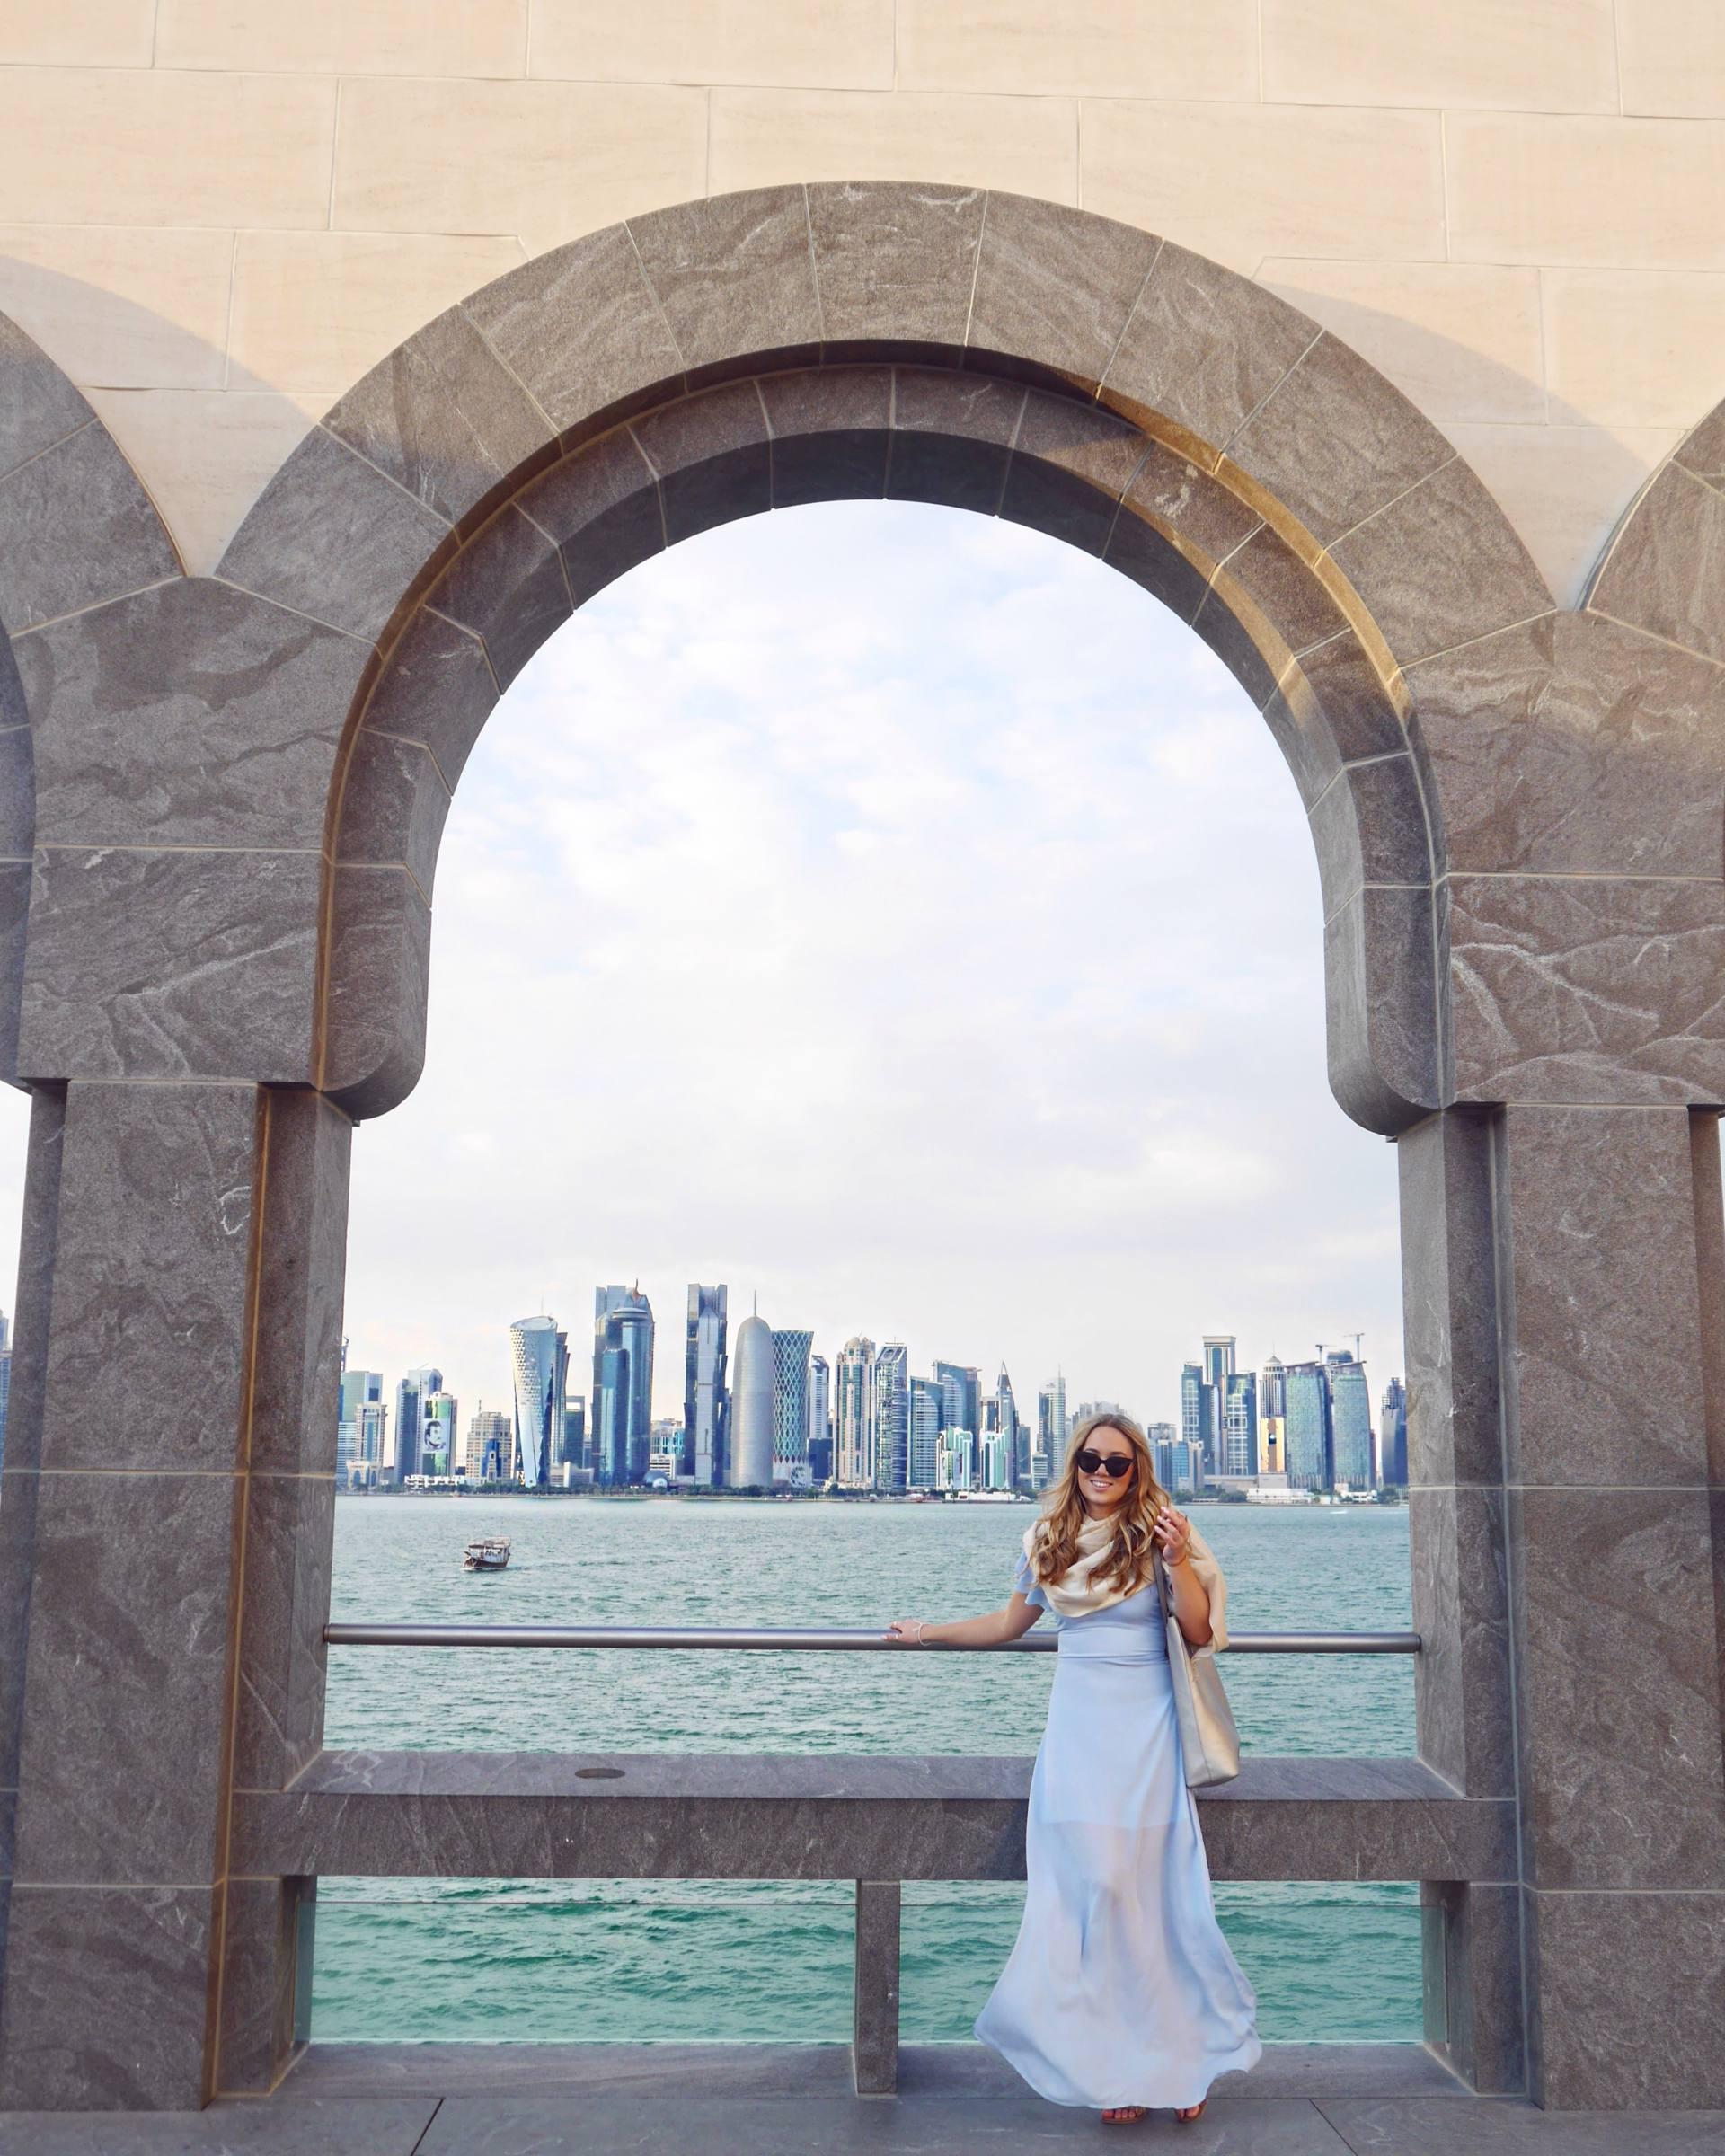 The Travelista Doha   Best Black Friday Travel Deals